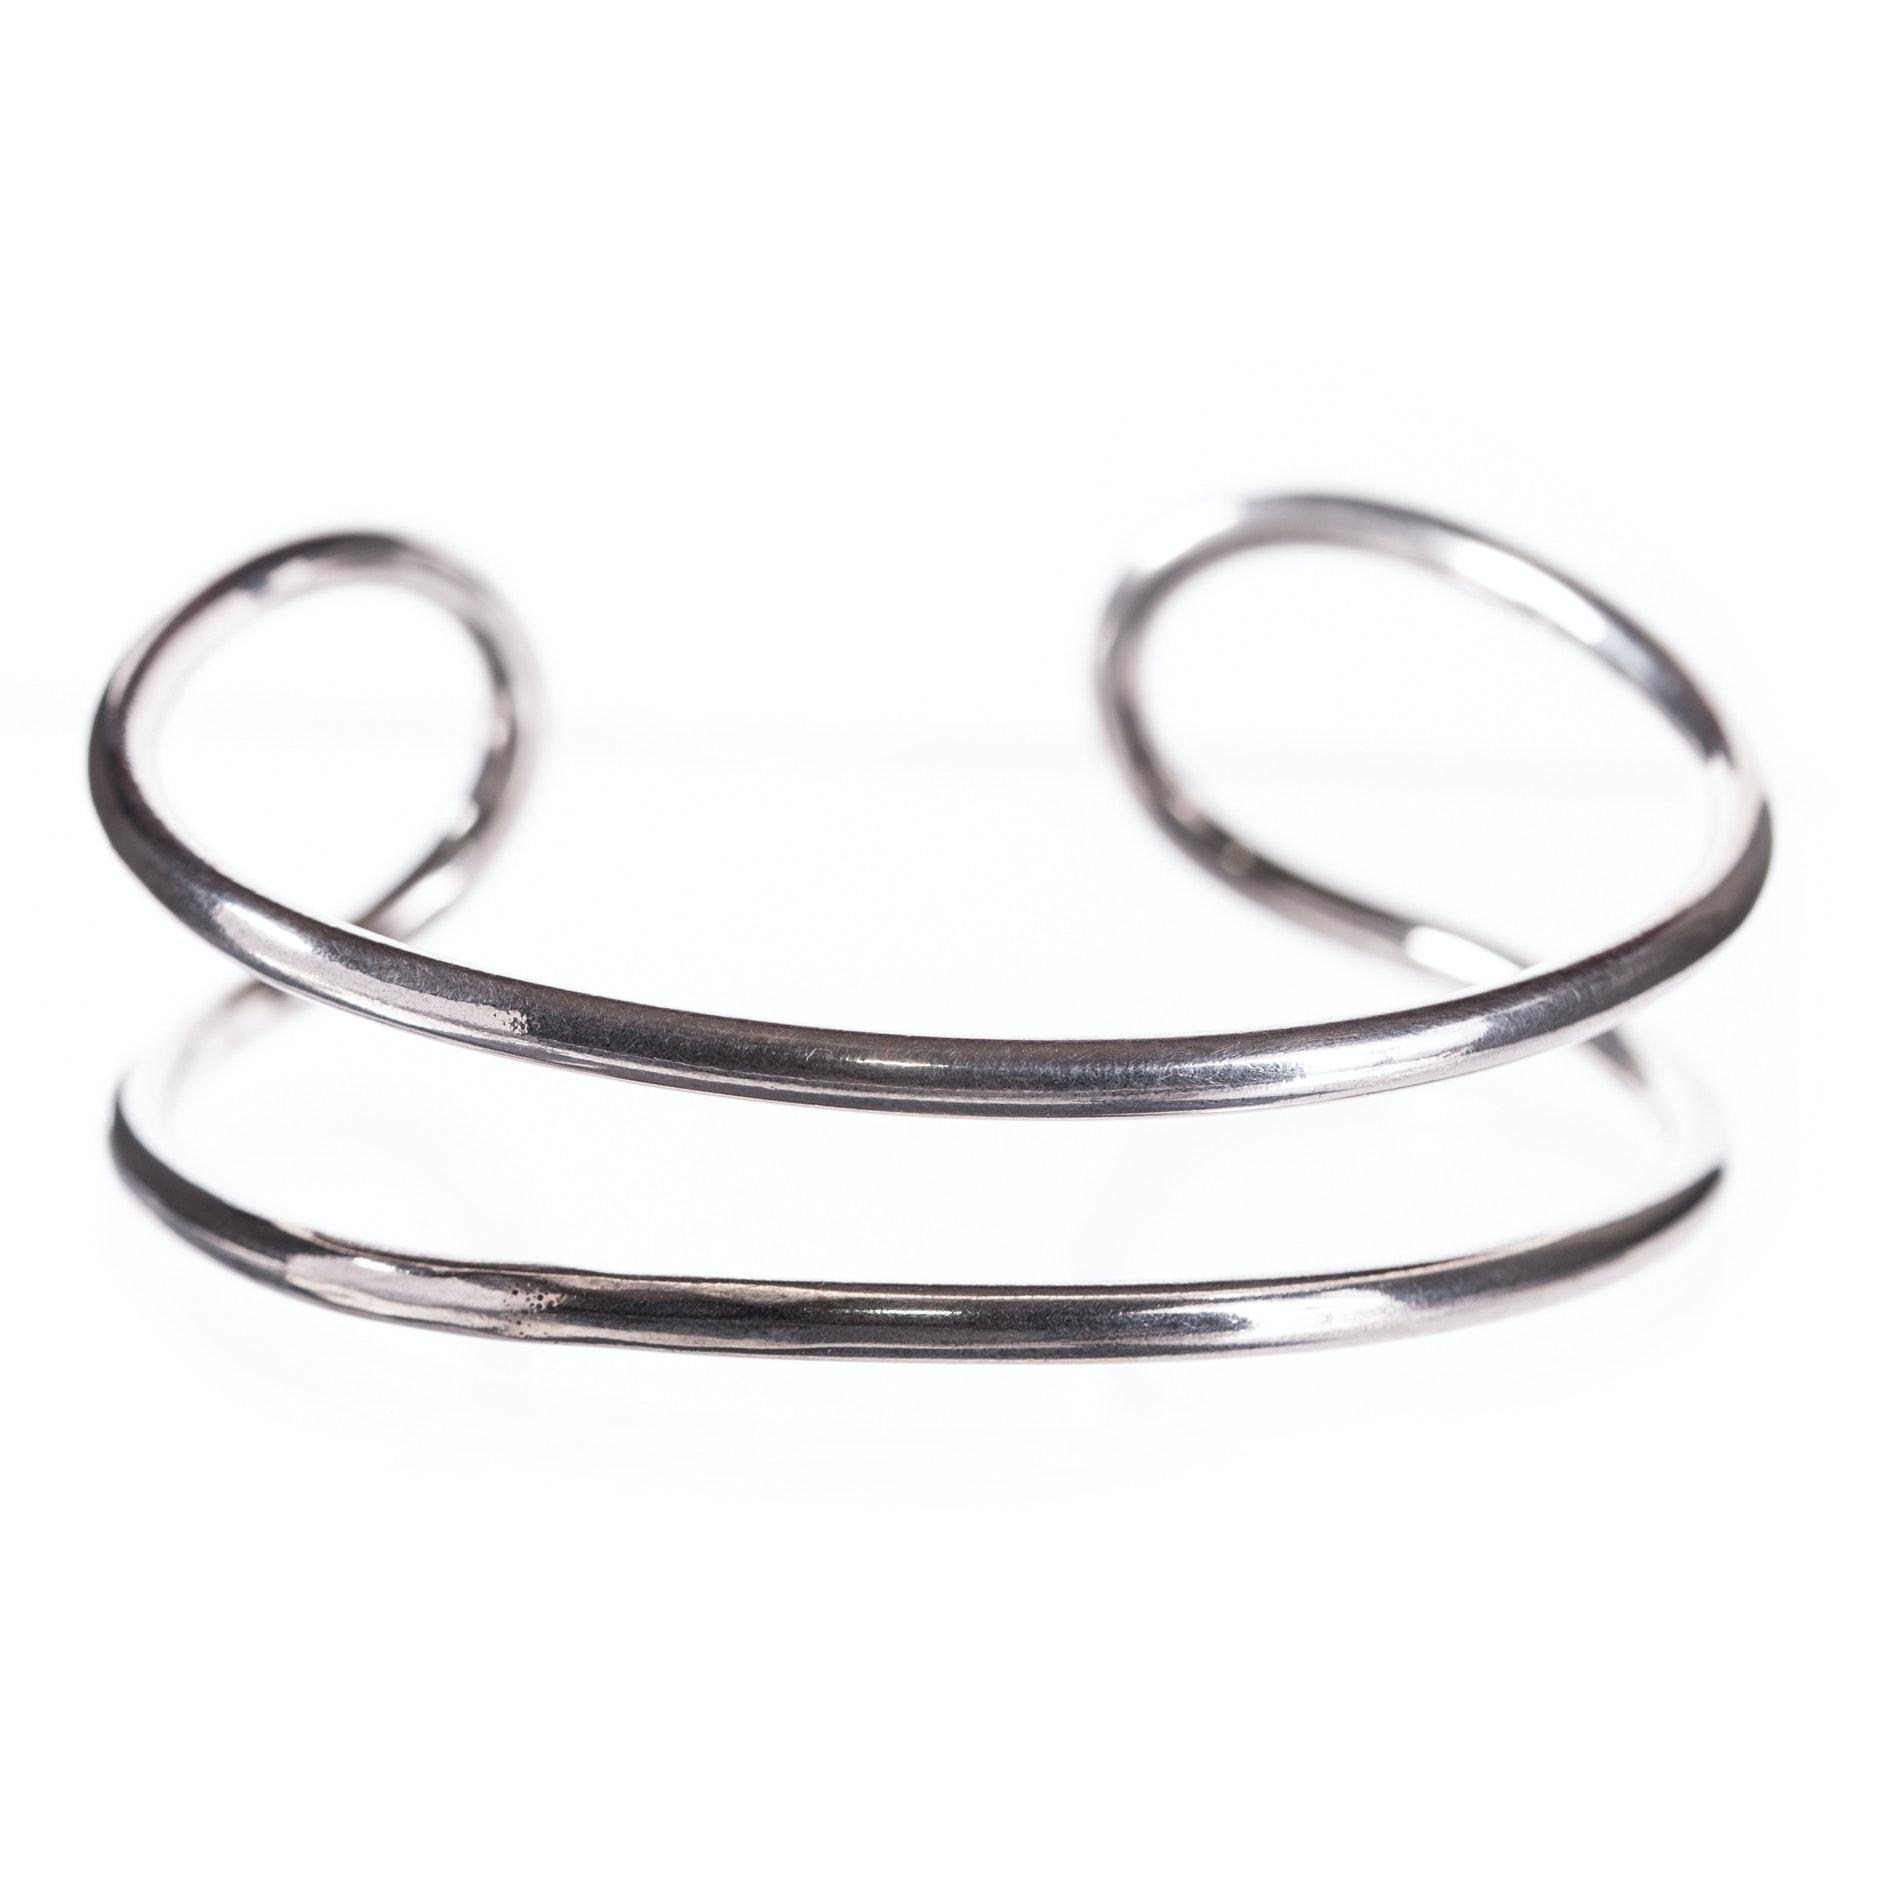 Elsa Peretti for Tiffany & Co. Sterling Silver Cuff Bracelet